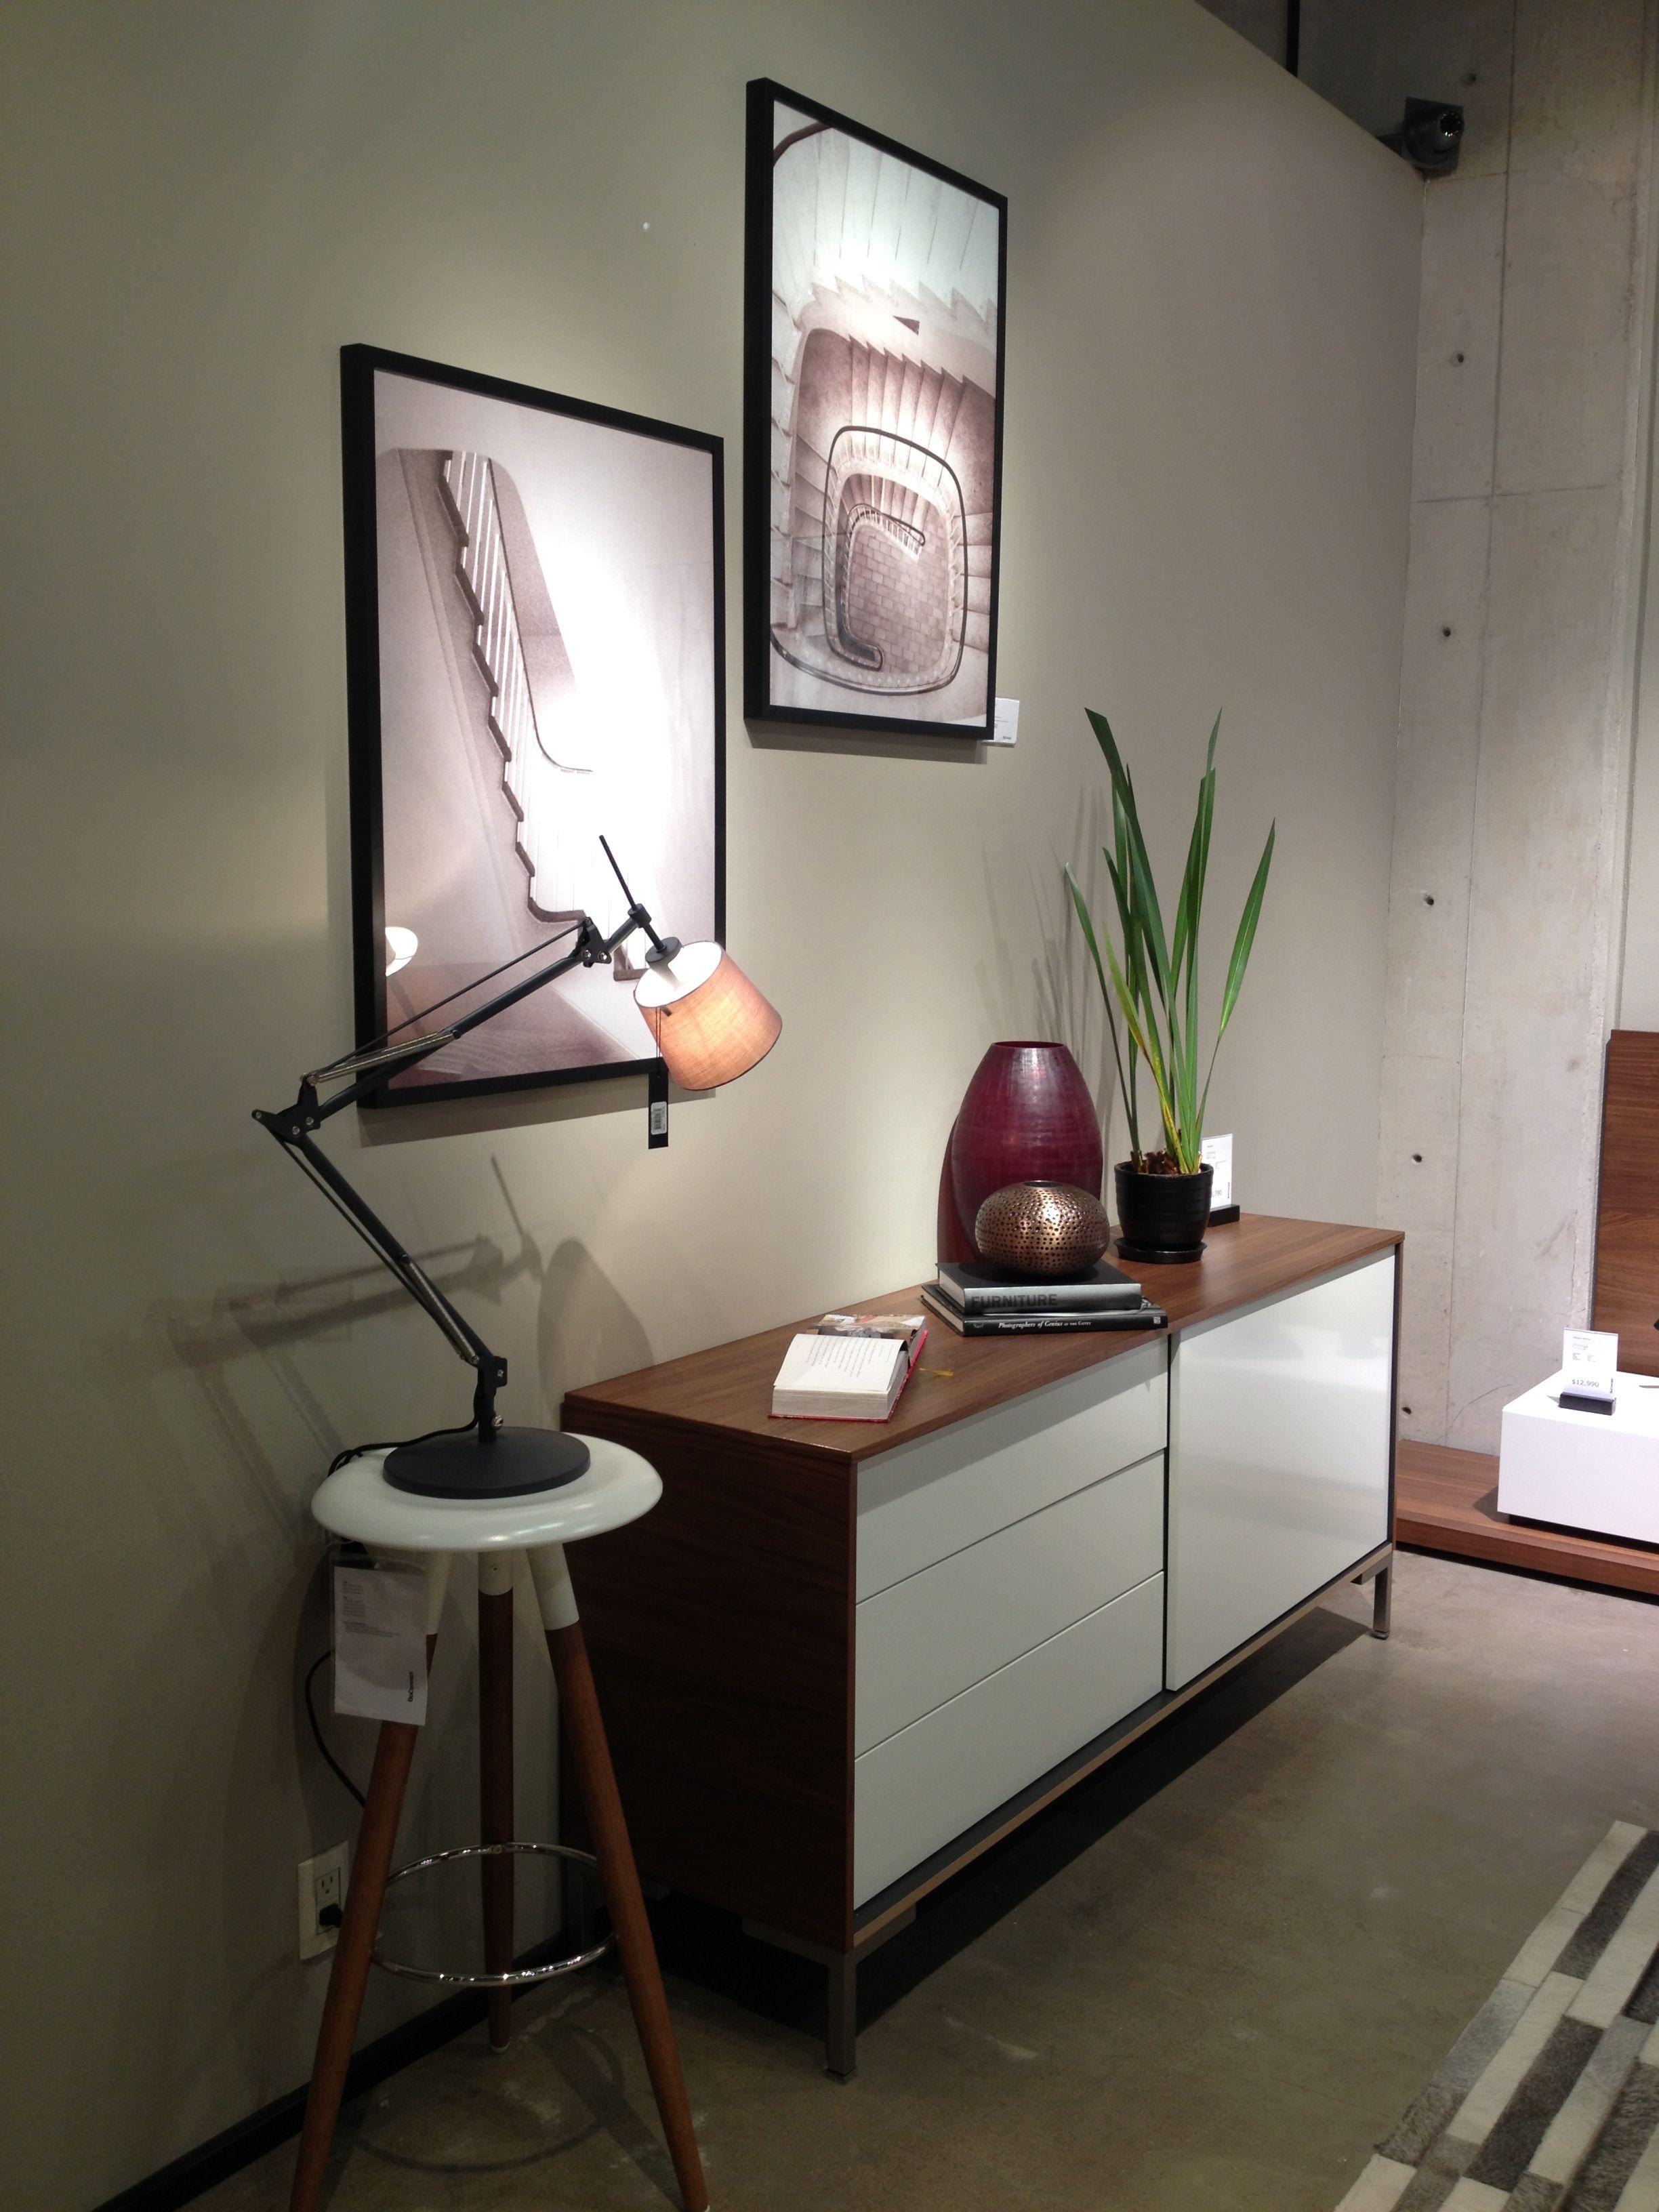 boconcept guadalajara mexico berlin lamp inspiring showrooms pinterest boconcept. Black Bedroom Furniture Sets. Home Design Ideas